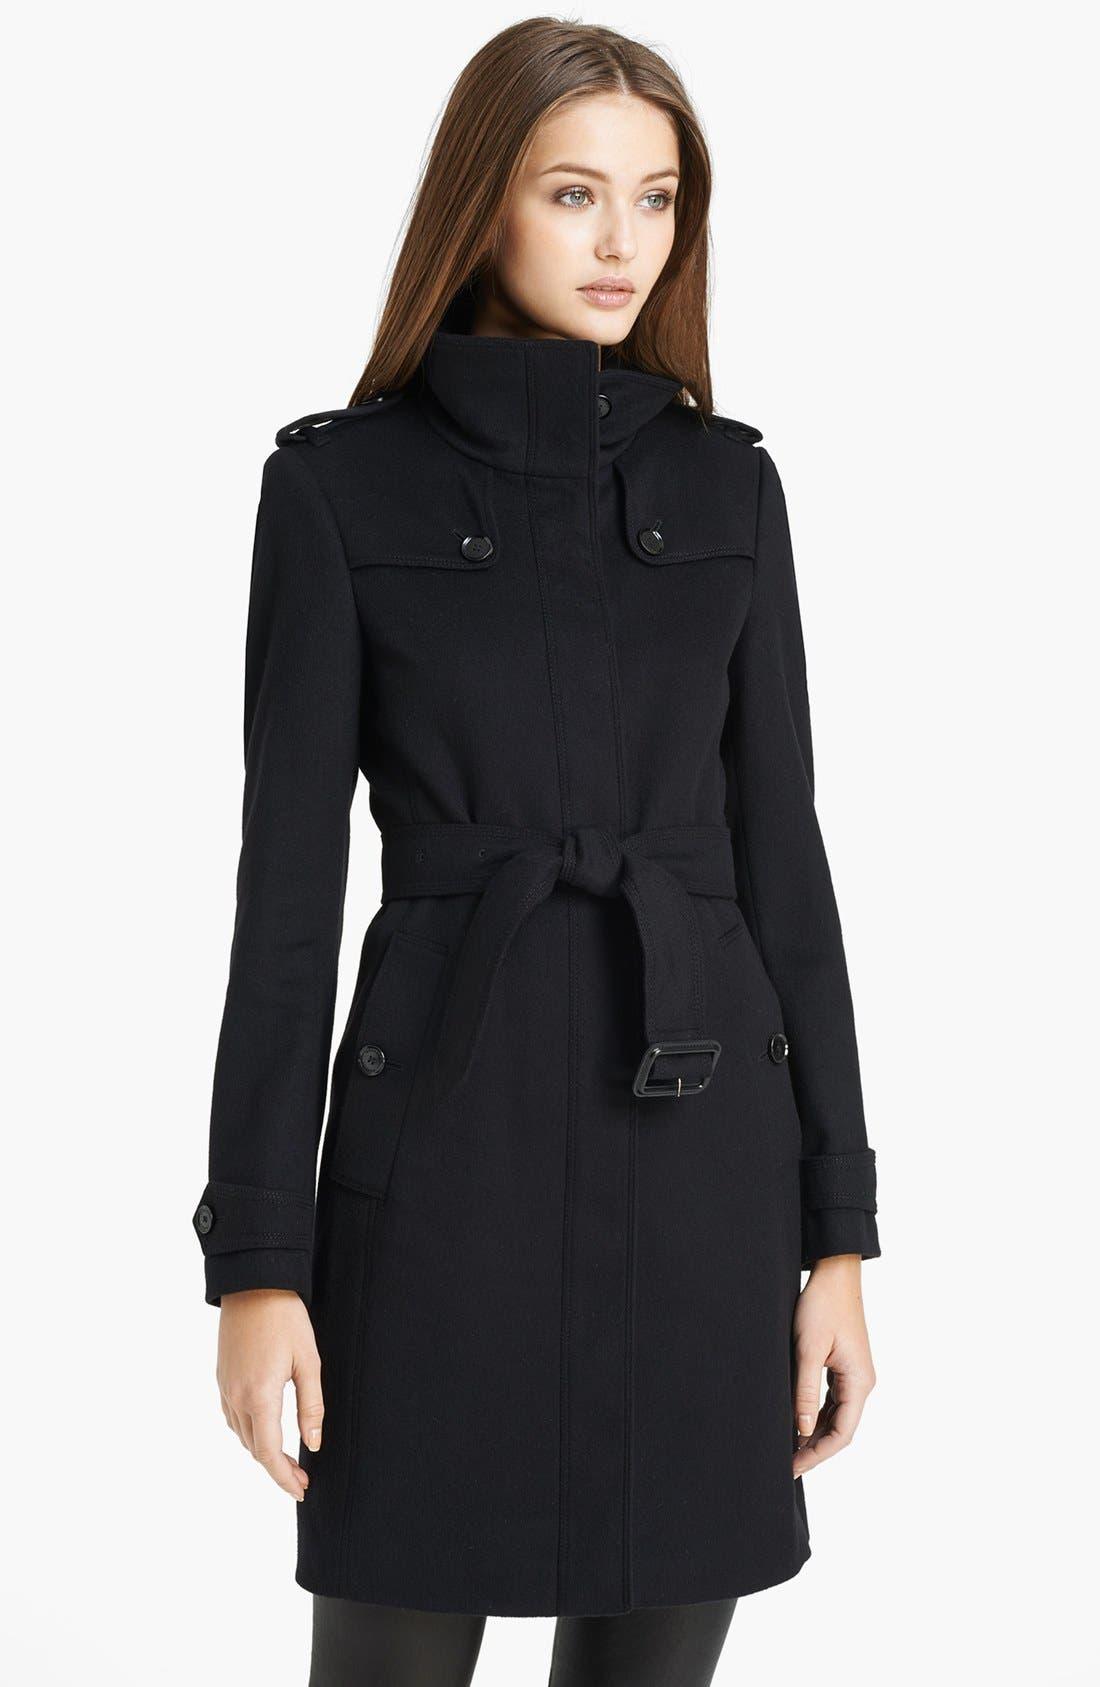 'Basingstoke' Wool & Cashmere Coat,                             Main thumbnail 1, color,                             001